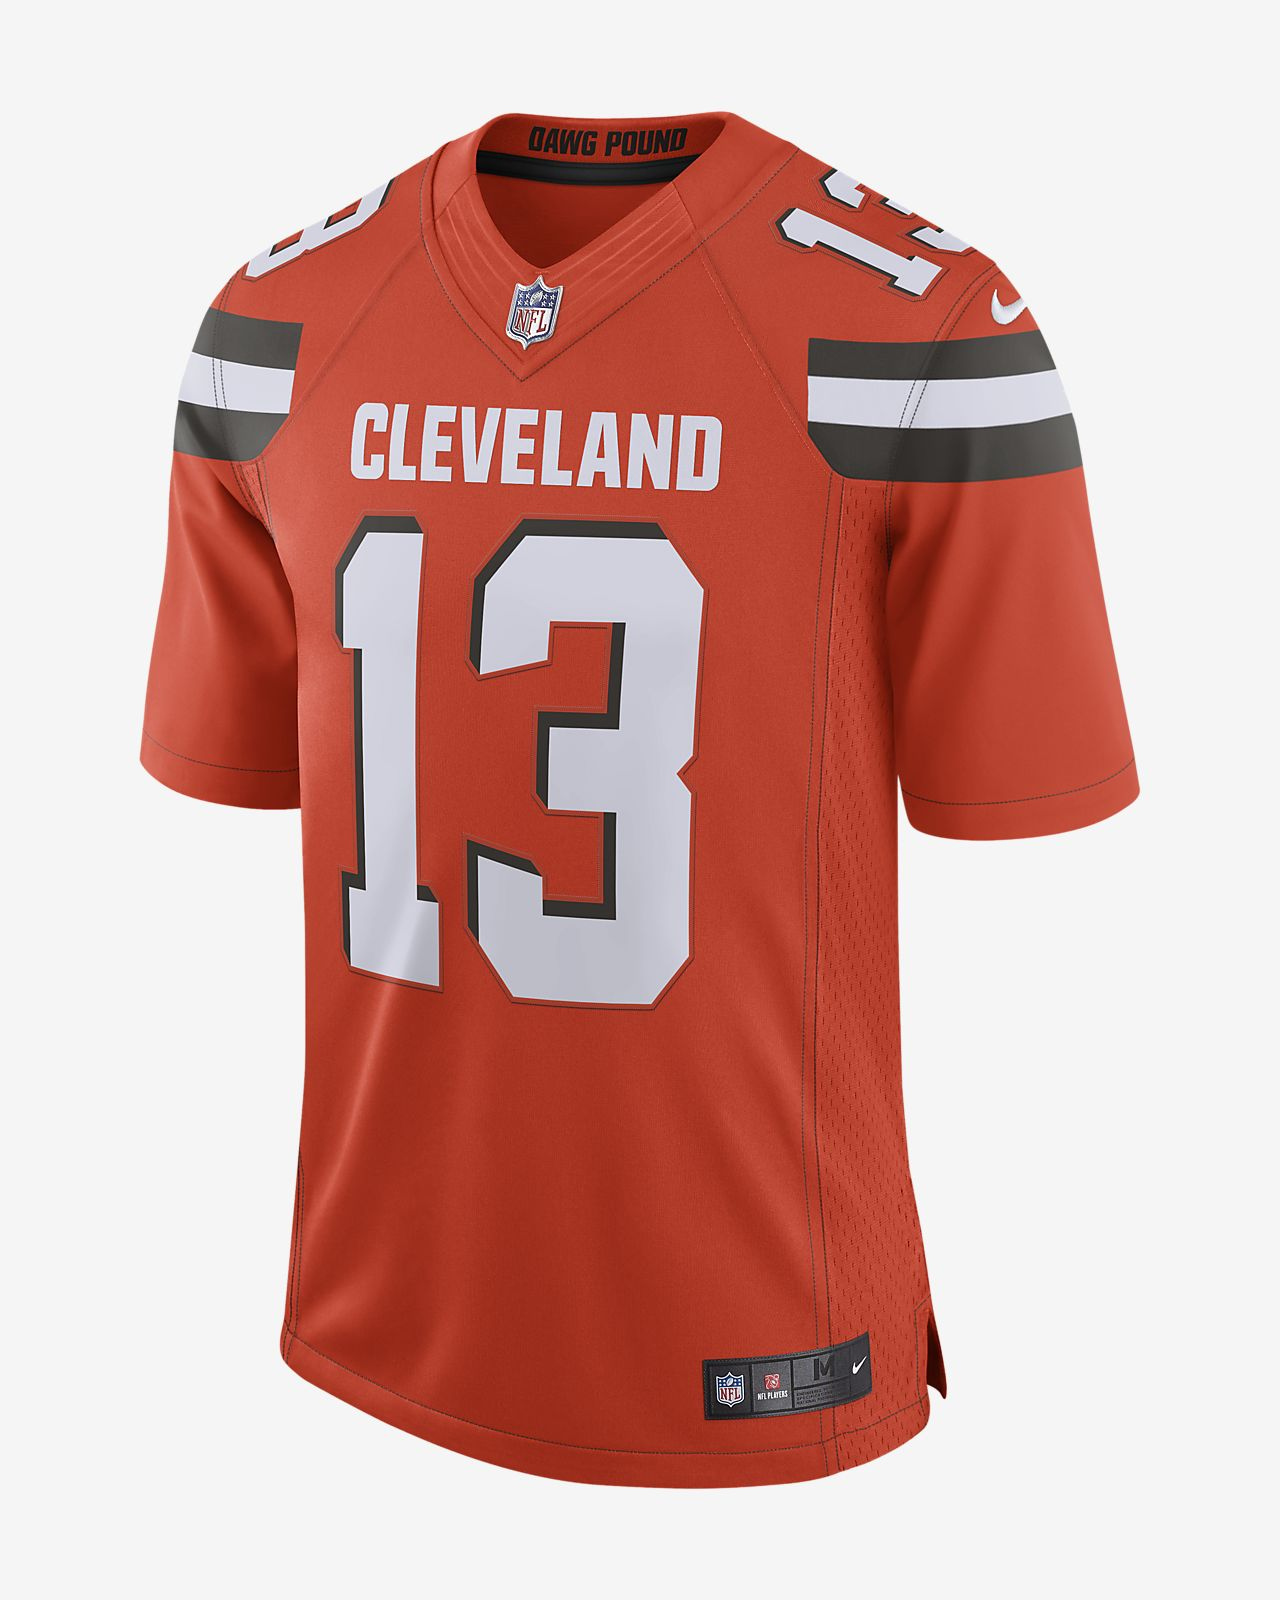 innovative design 2fb76 6aa4e NFL Cleveland Browns (Odell Beckham Jr.) Men's Limited Football Jersey